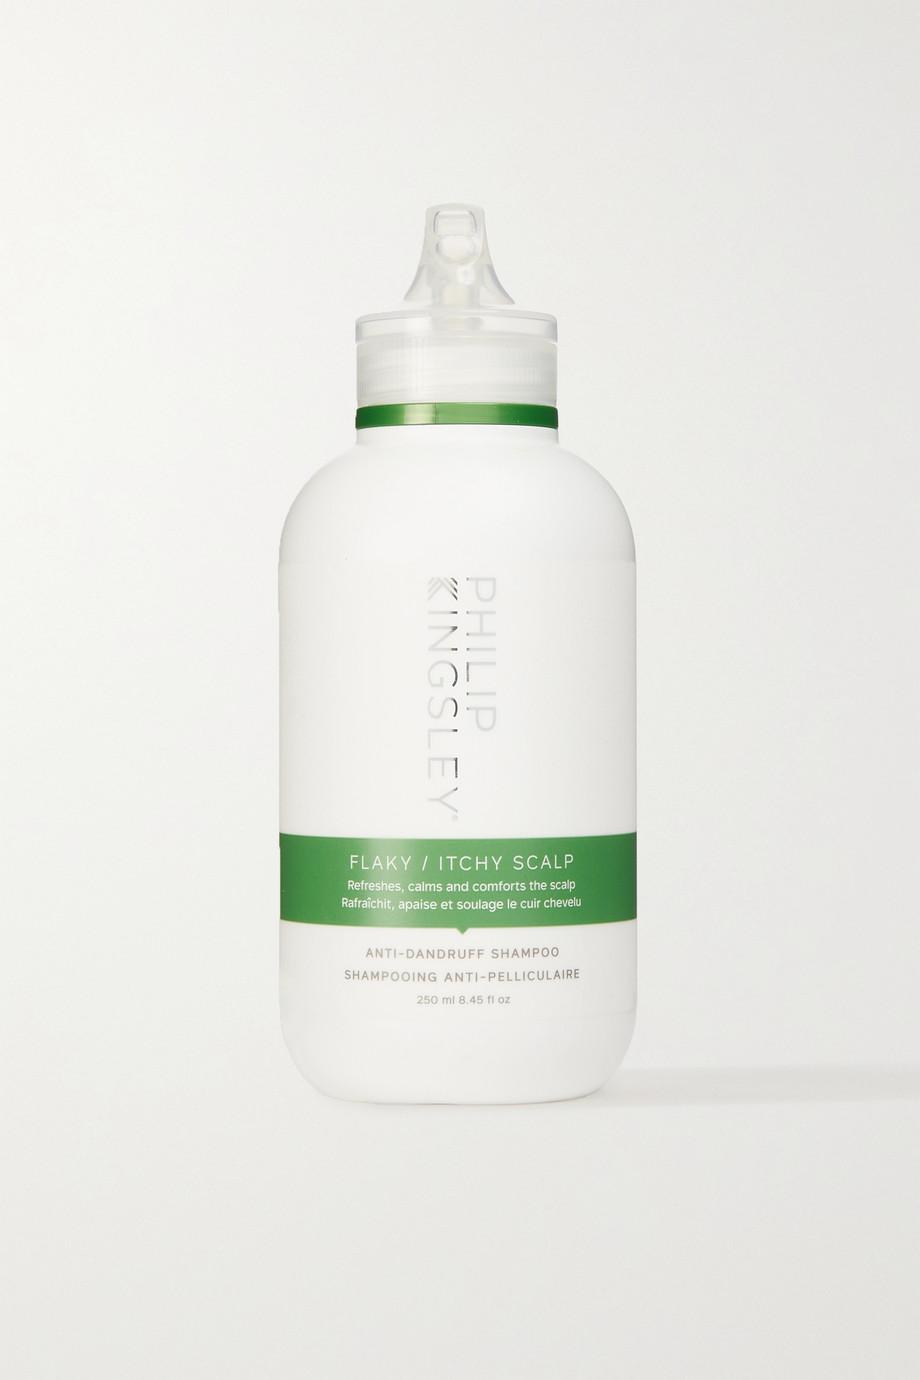 PHILIP KINGSLEY Flaky Itchy Scalp Shampoo, 250ml